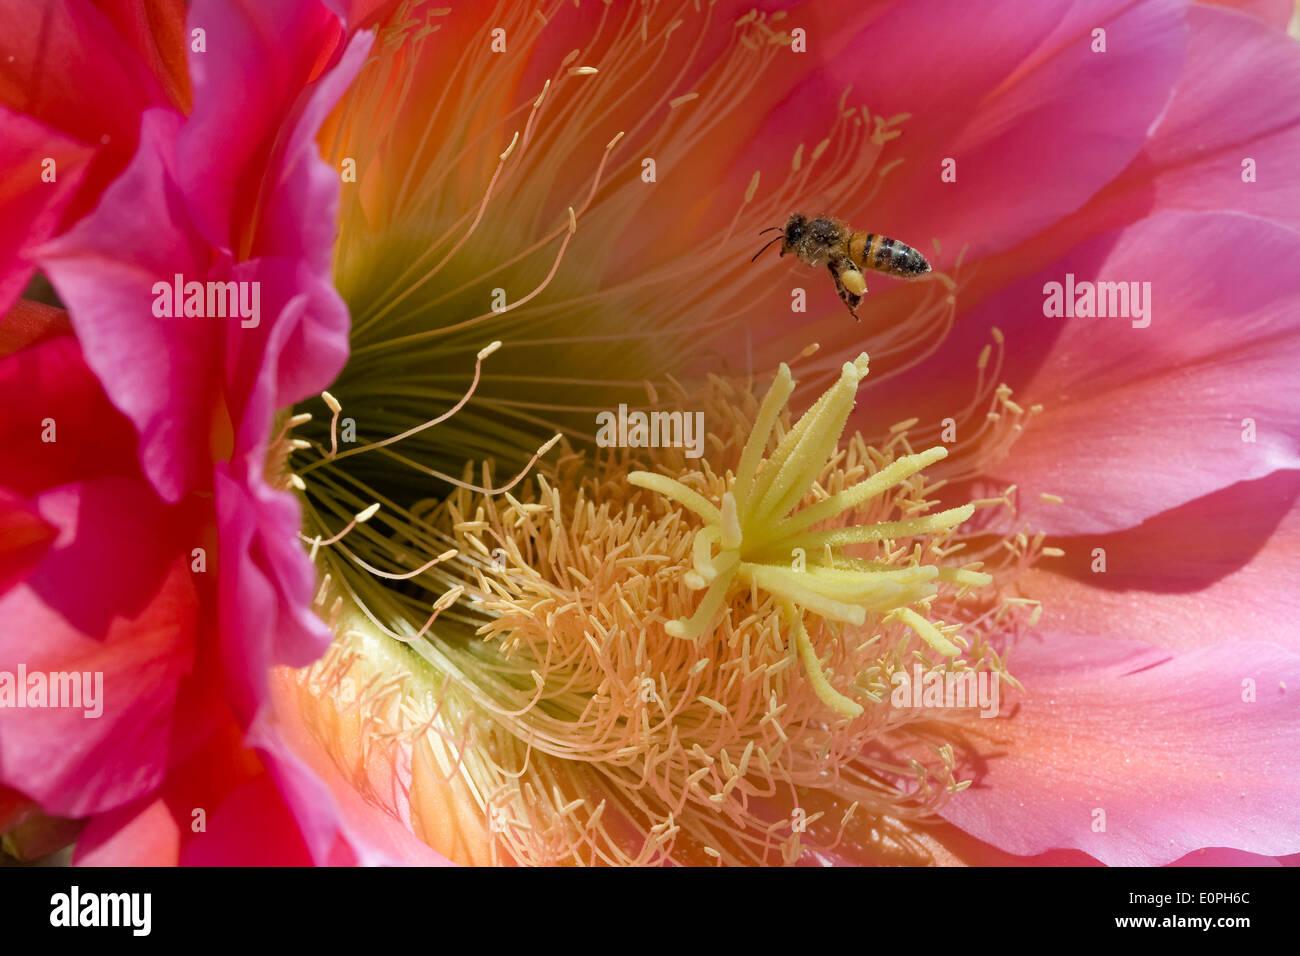 Honeybee Pollinating a Trichocereus Cactus Flower - Stock Image